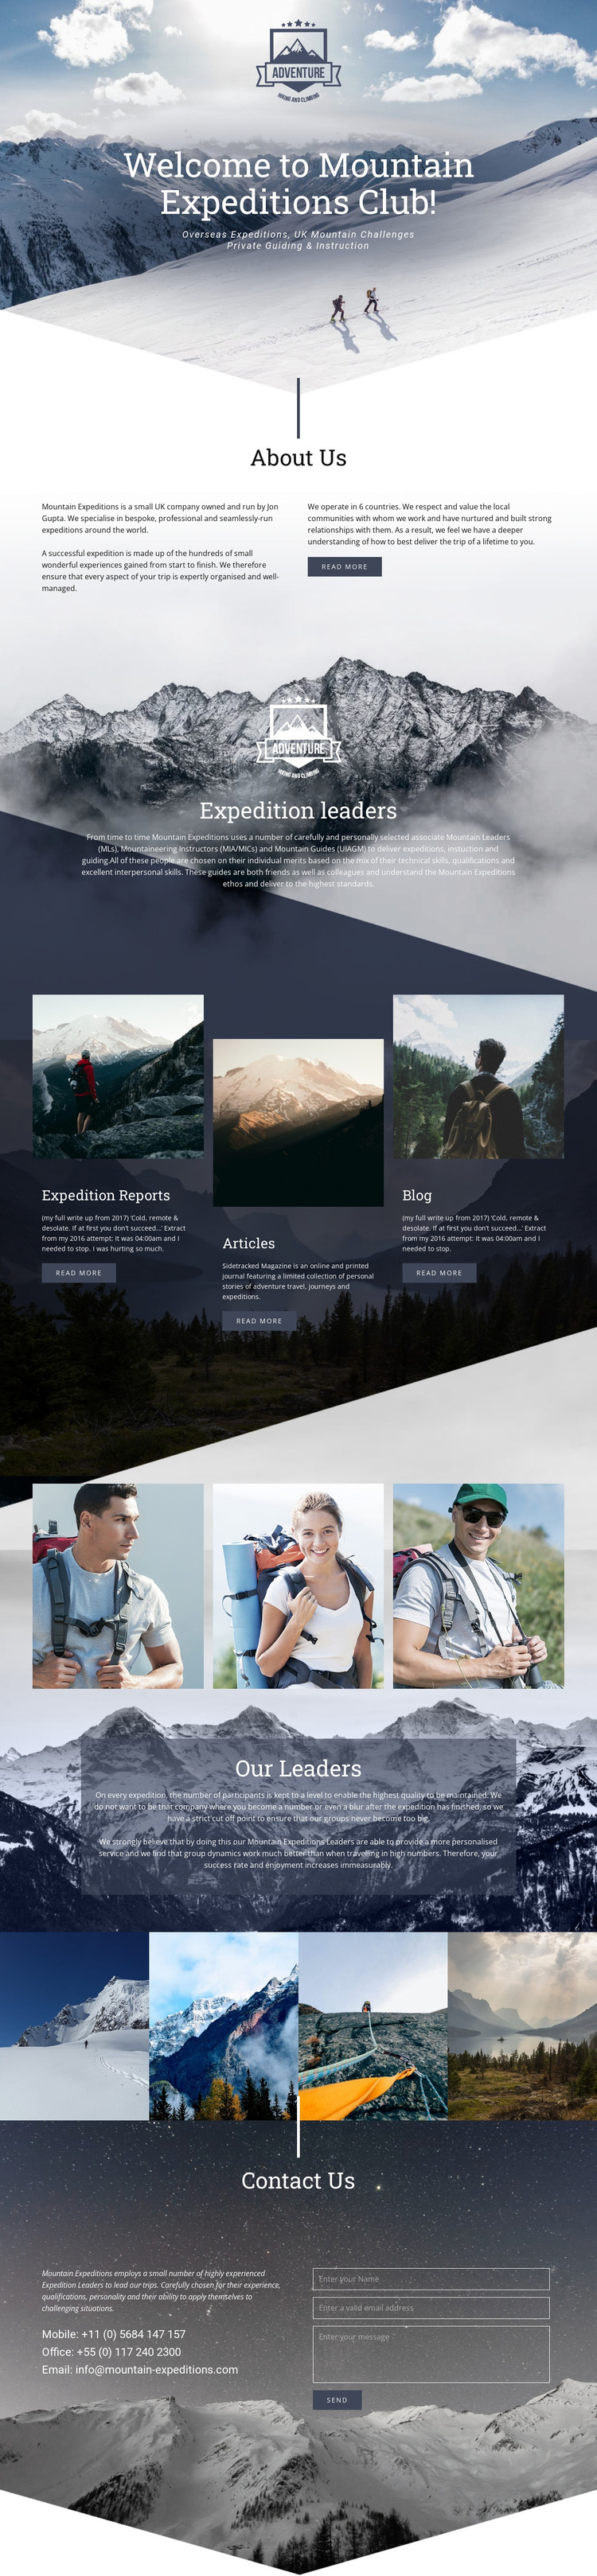 Extreme mountain expedition Web Design